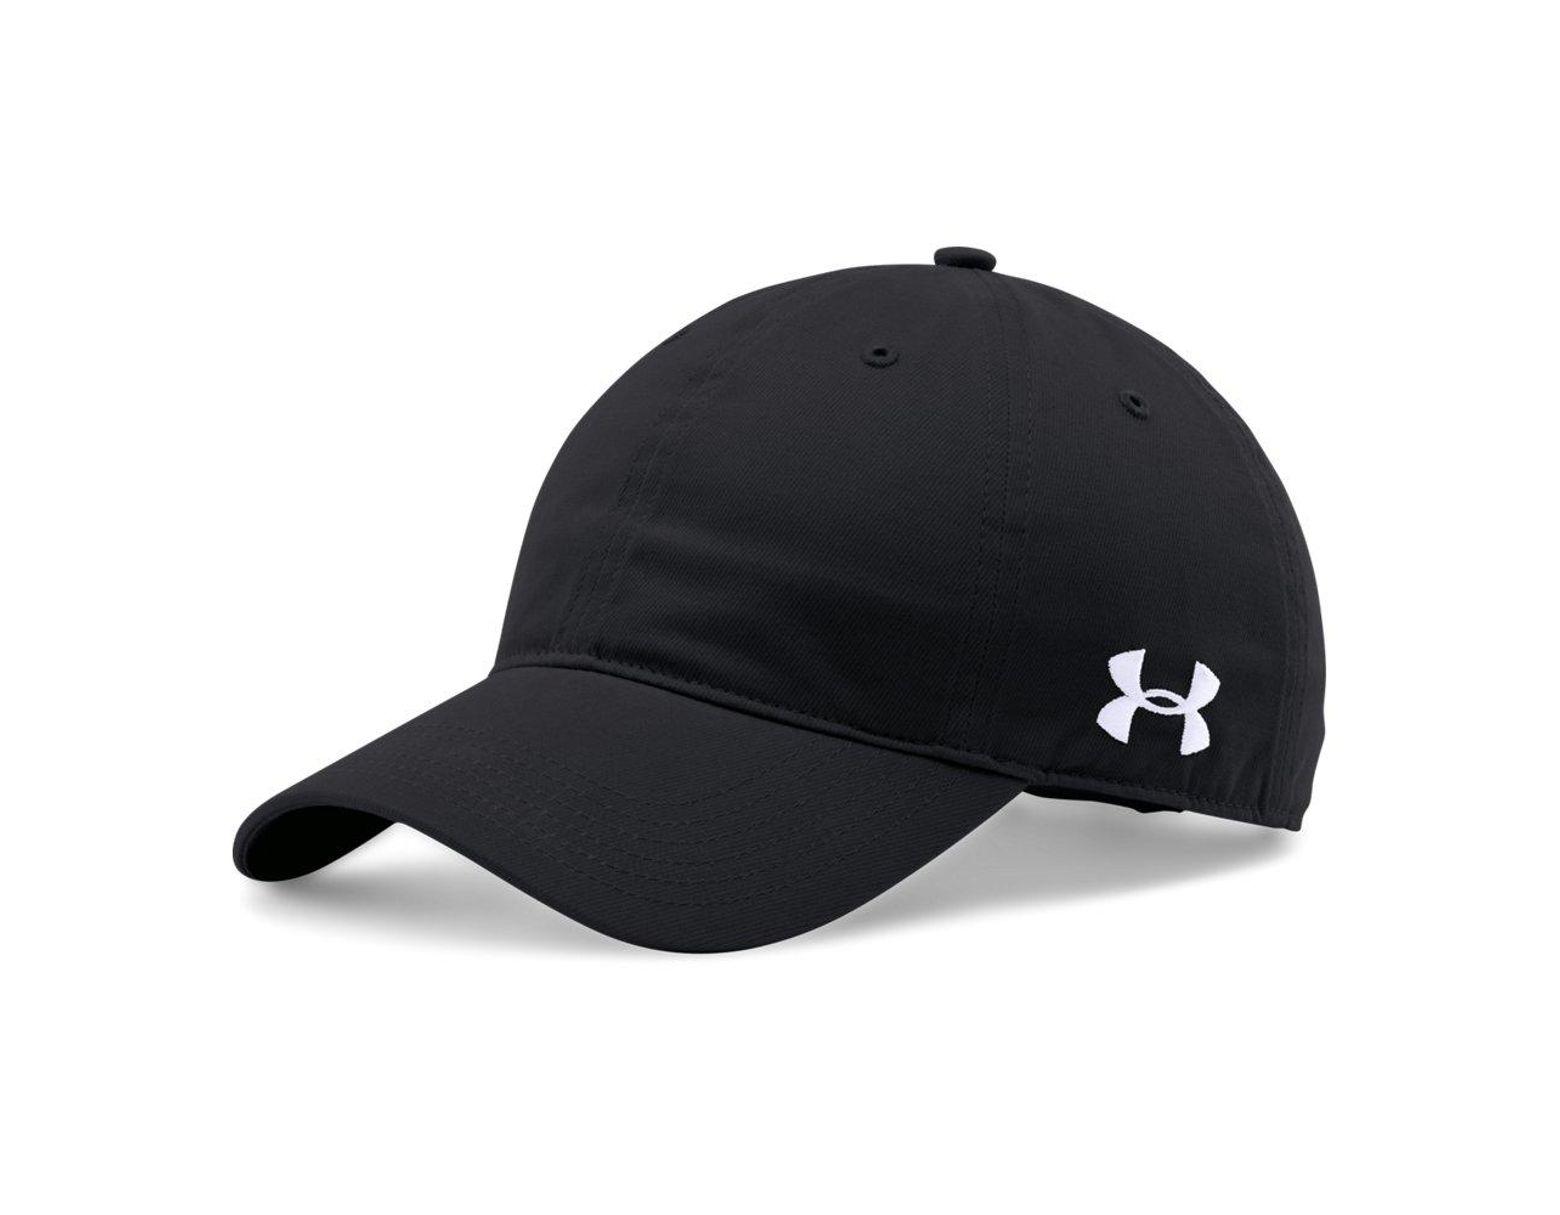 91349ced0 Men's Black Chino Adjustable Cap